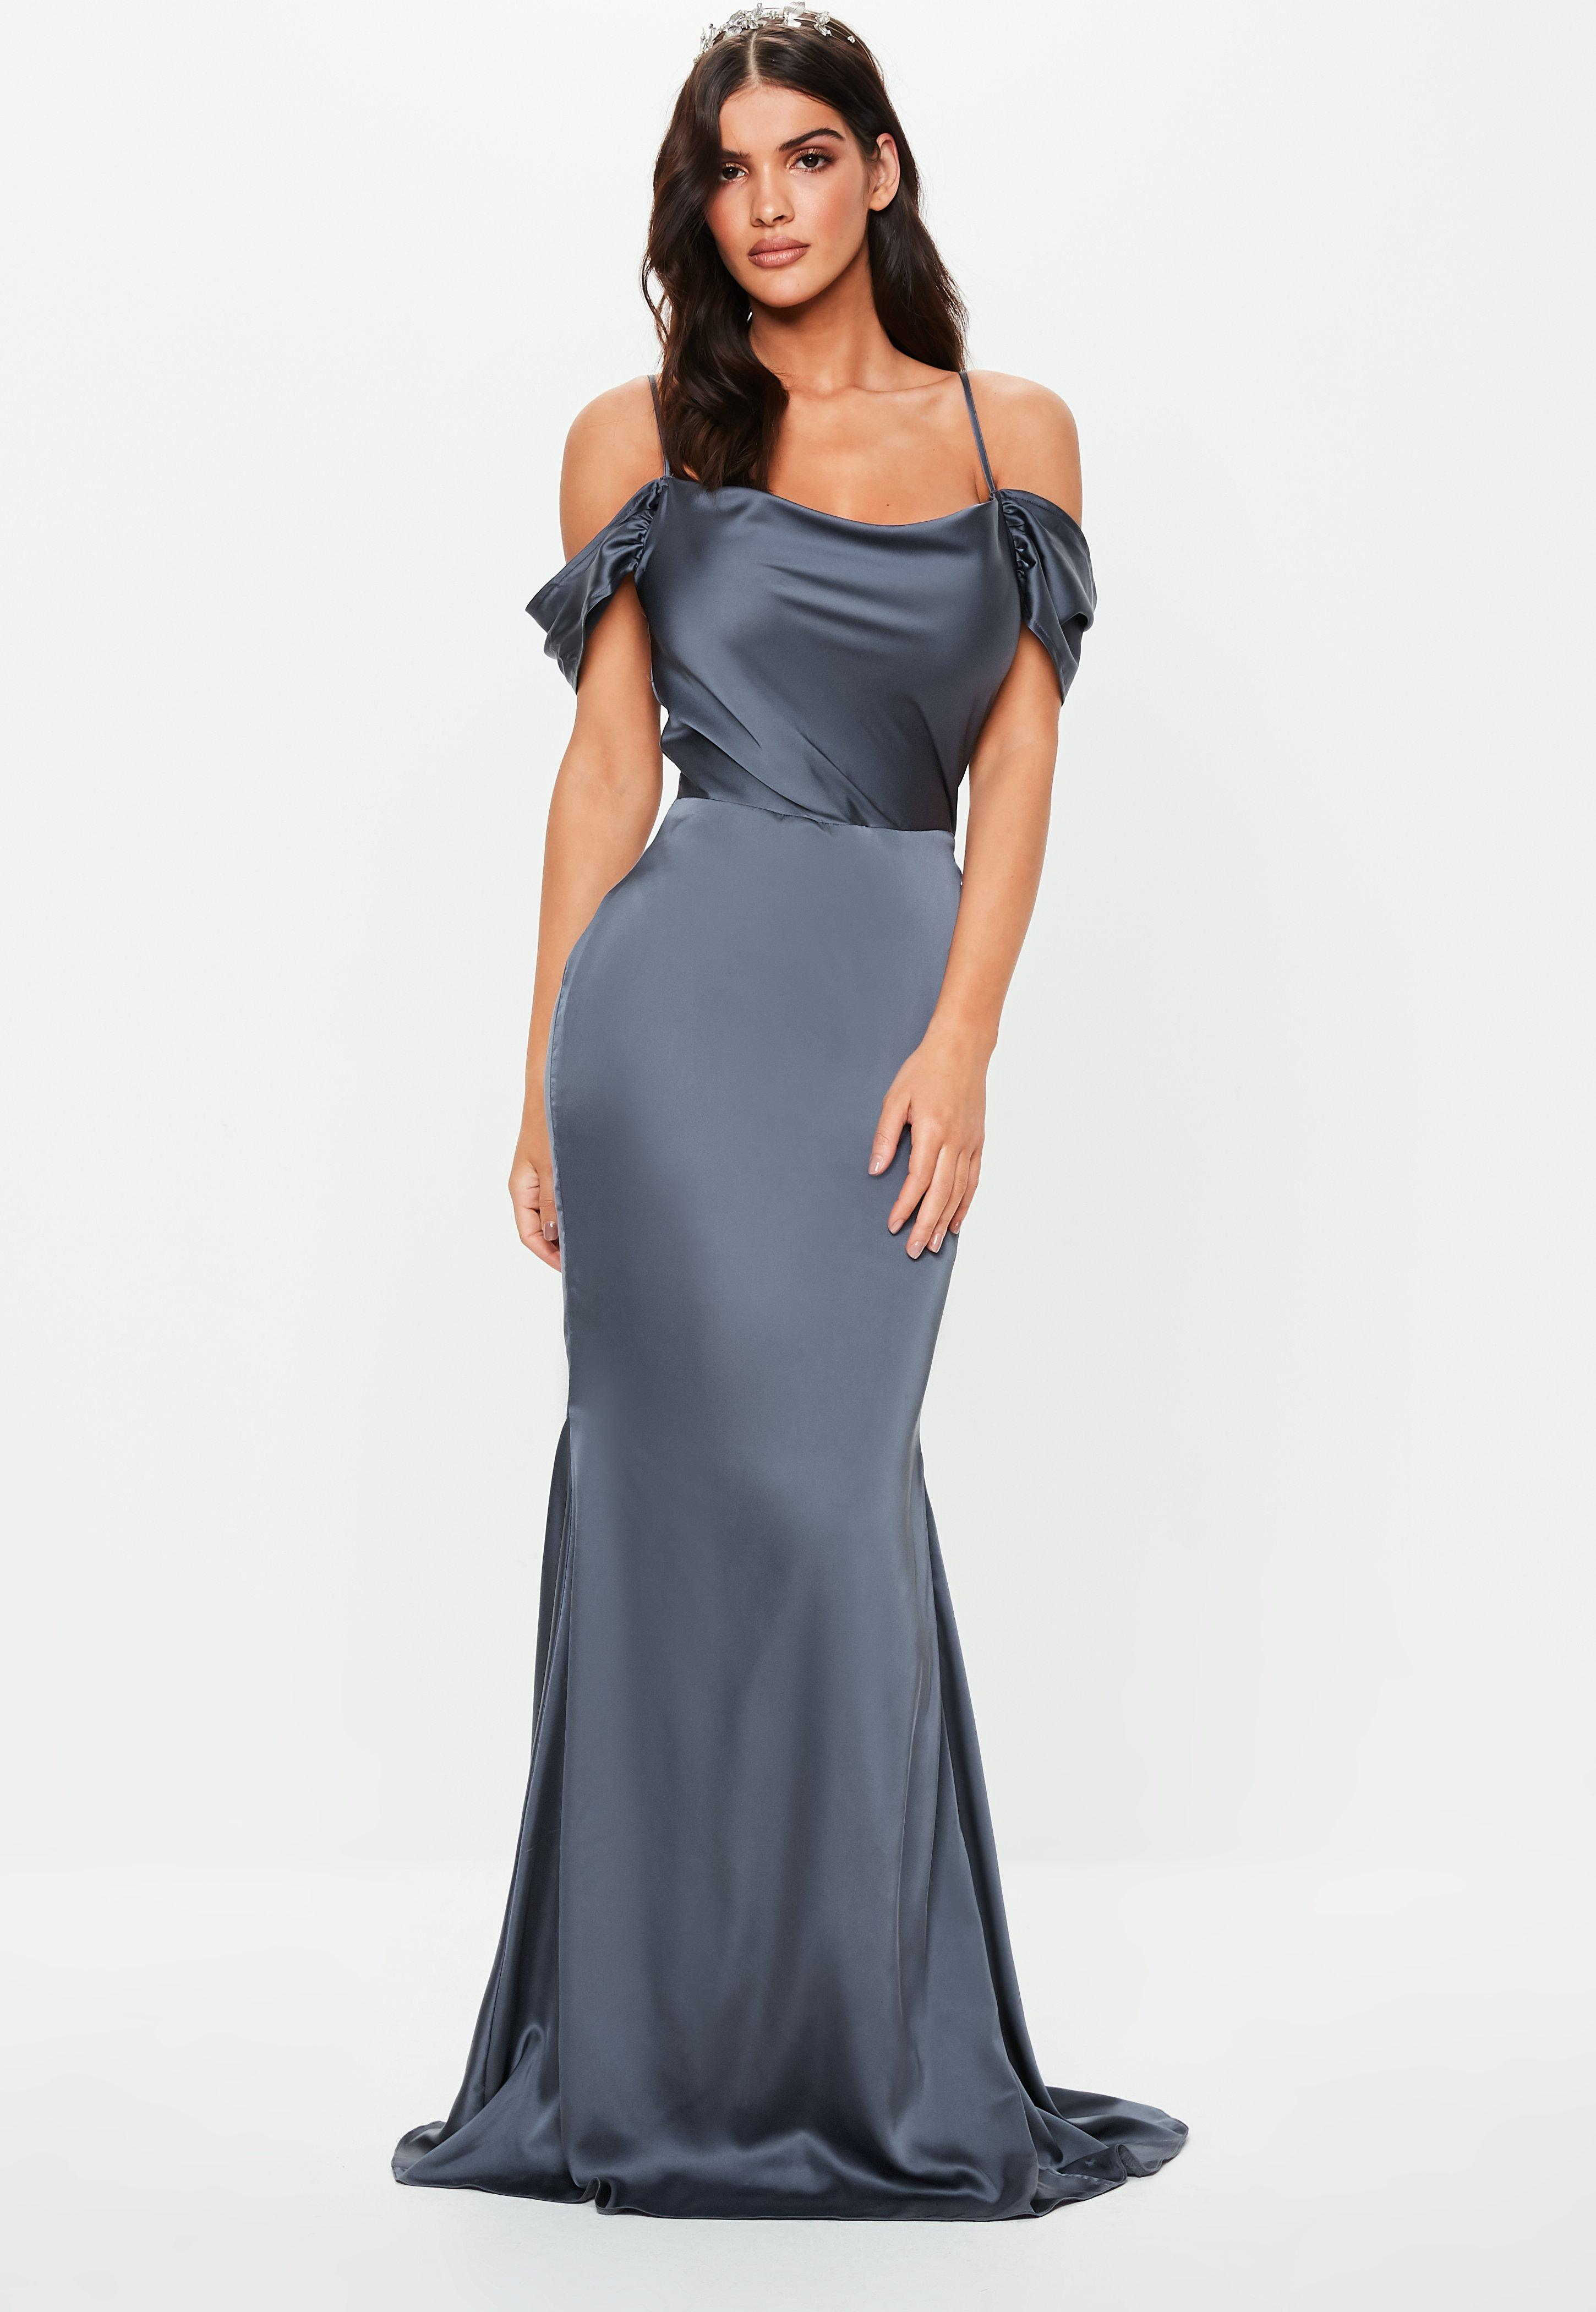 Gray Long Formal Dress